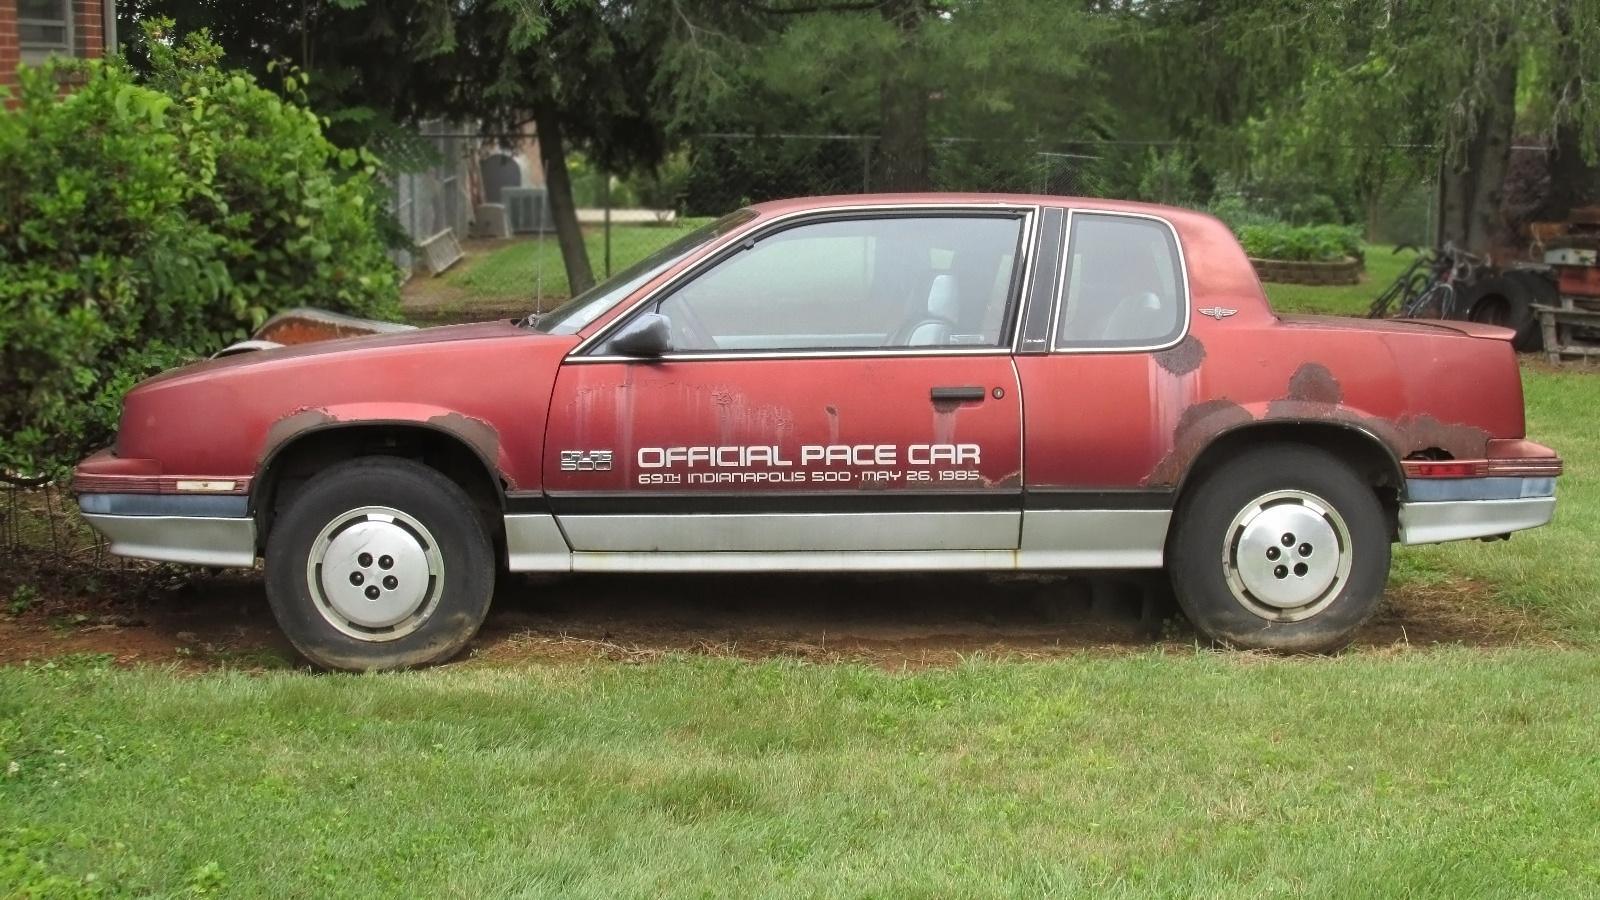 1985 indy 500 pace car 1985 oldsmobile calais 500. Black Bedroom Furniture Sets. Home Design Ideas